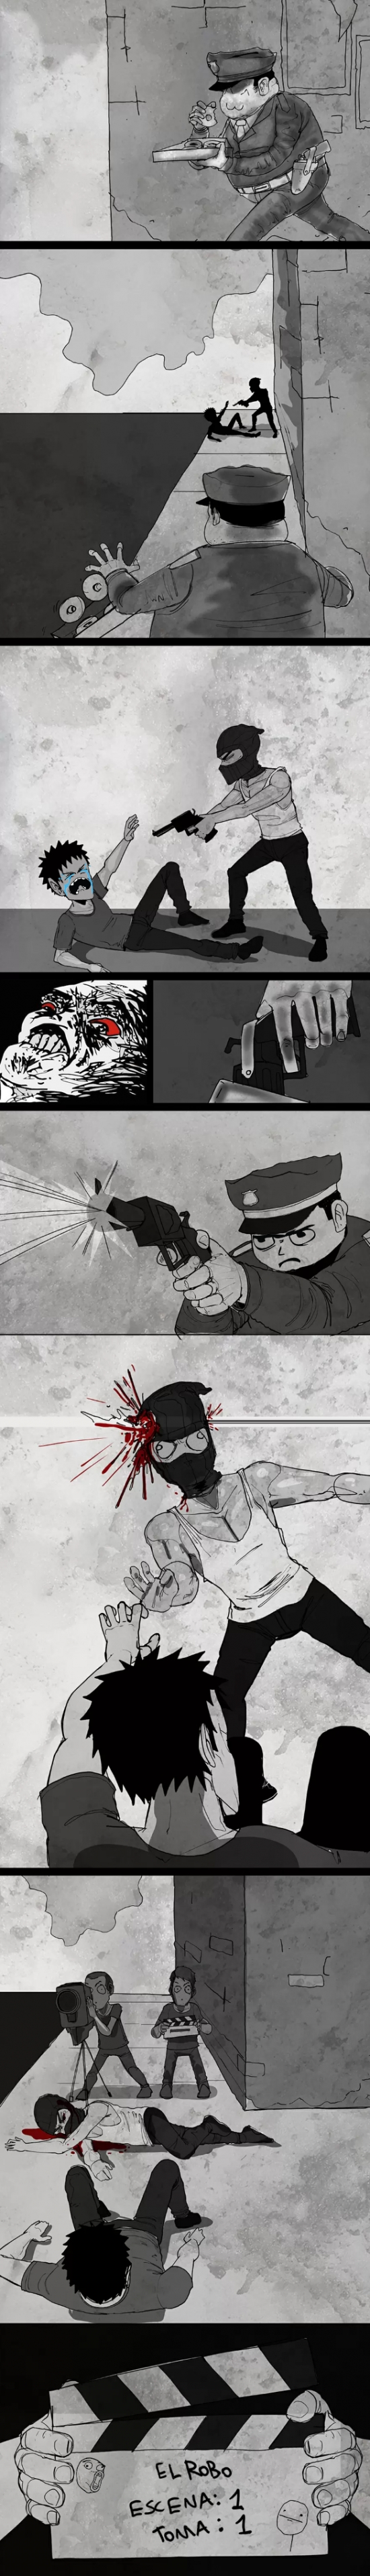 Mix - A veces ser un policía demasiado responsable te puede traer problemas